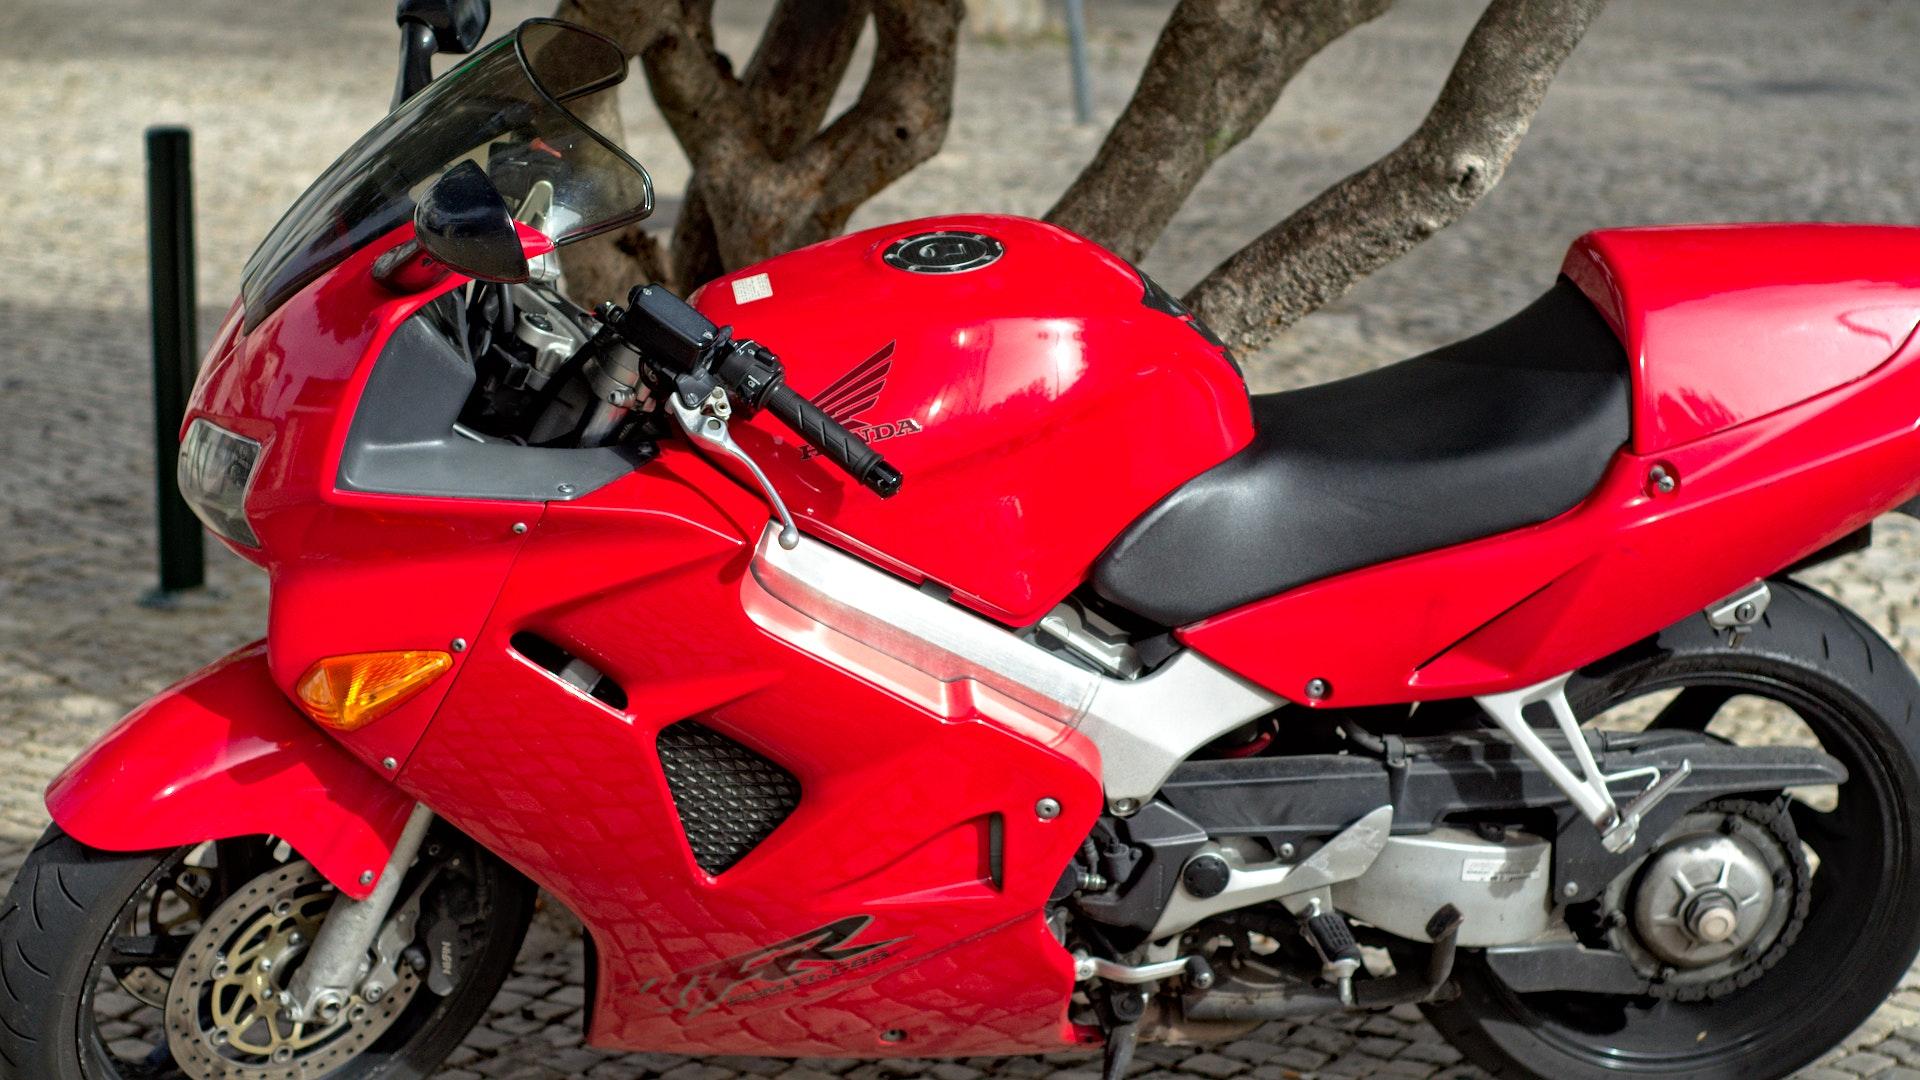 Free stock photo of Honda, motorcycle